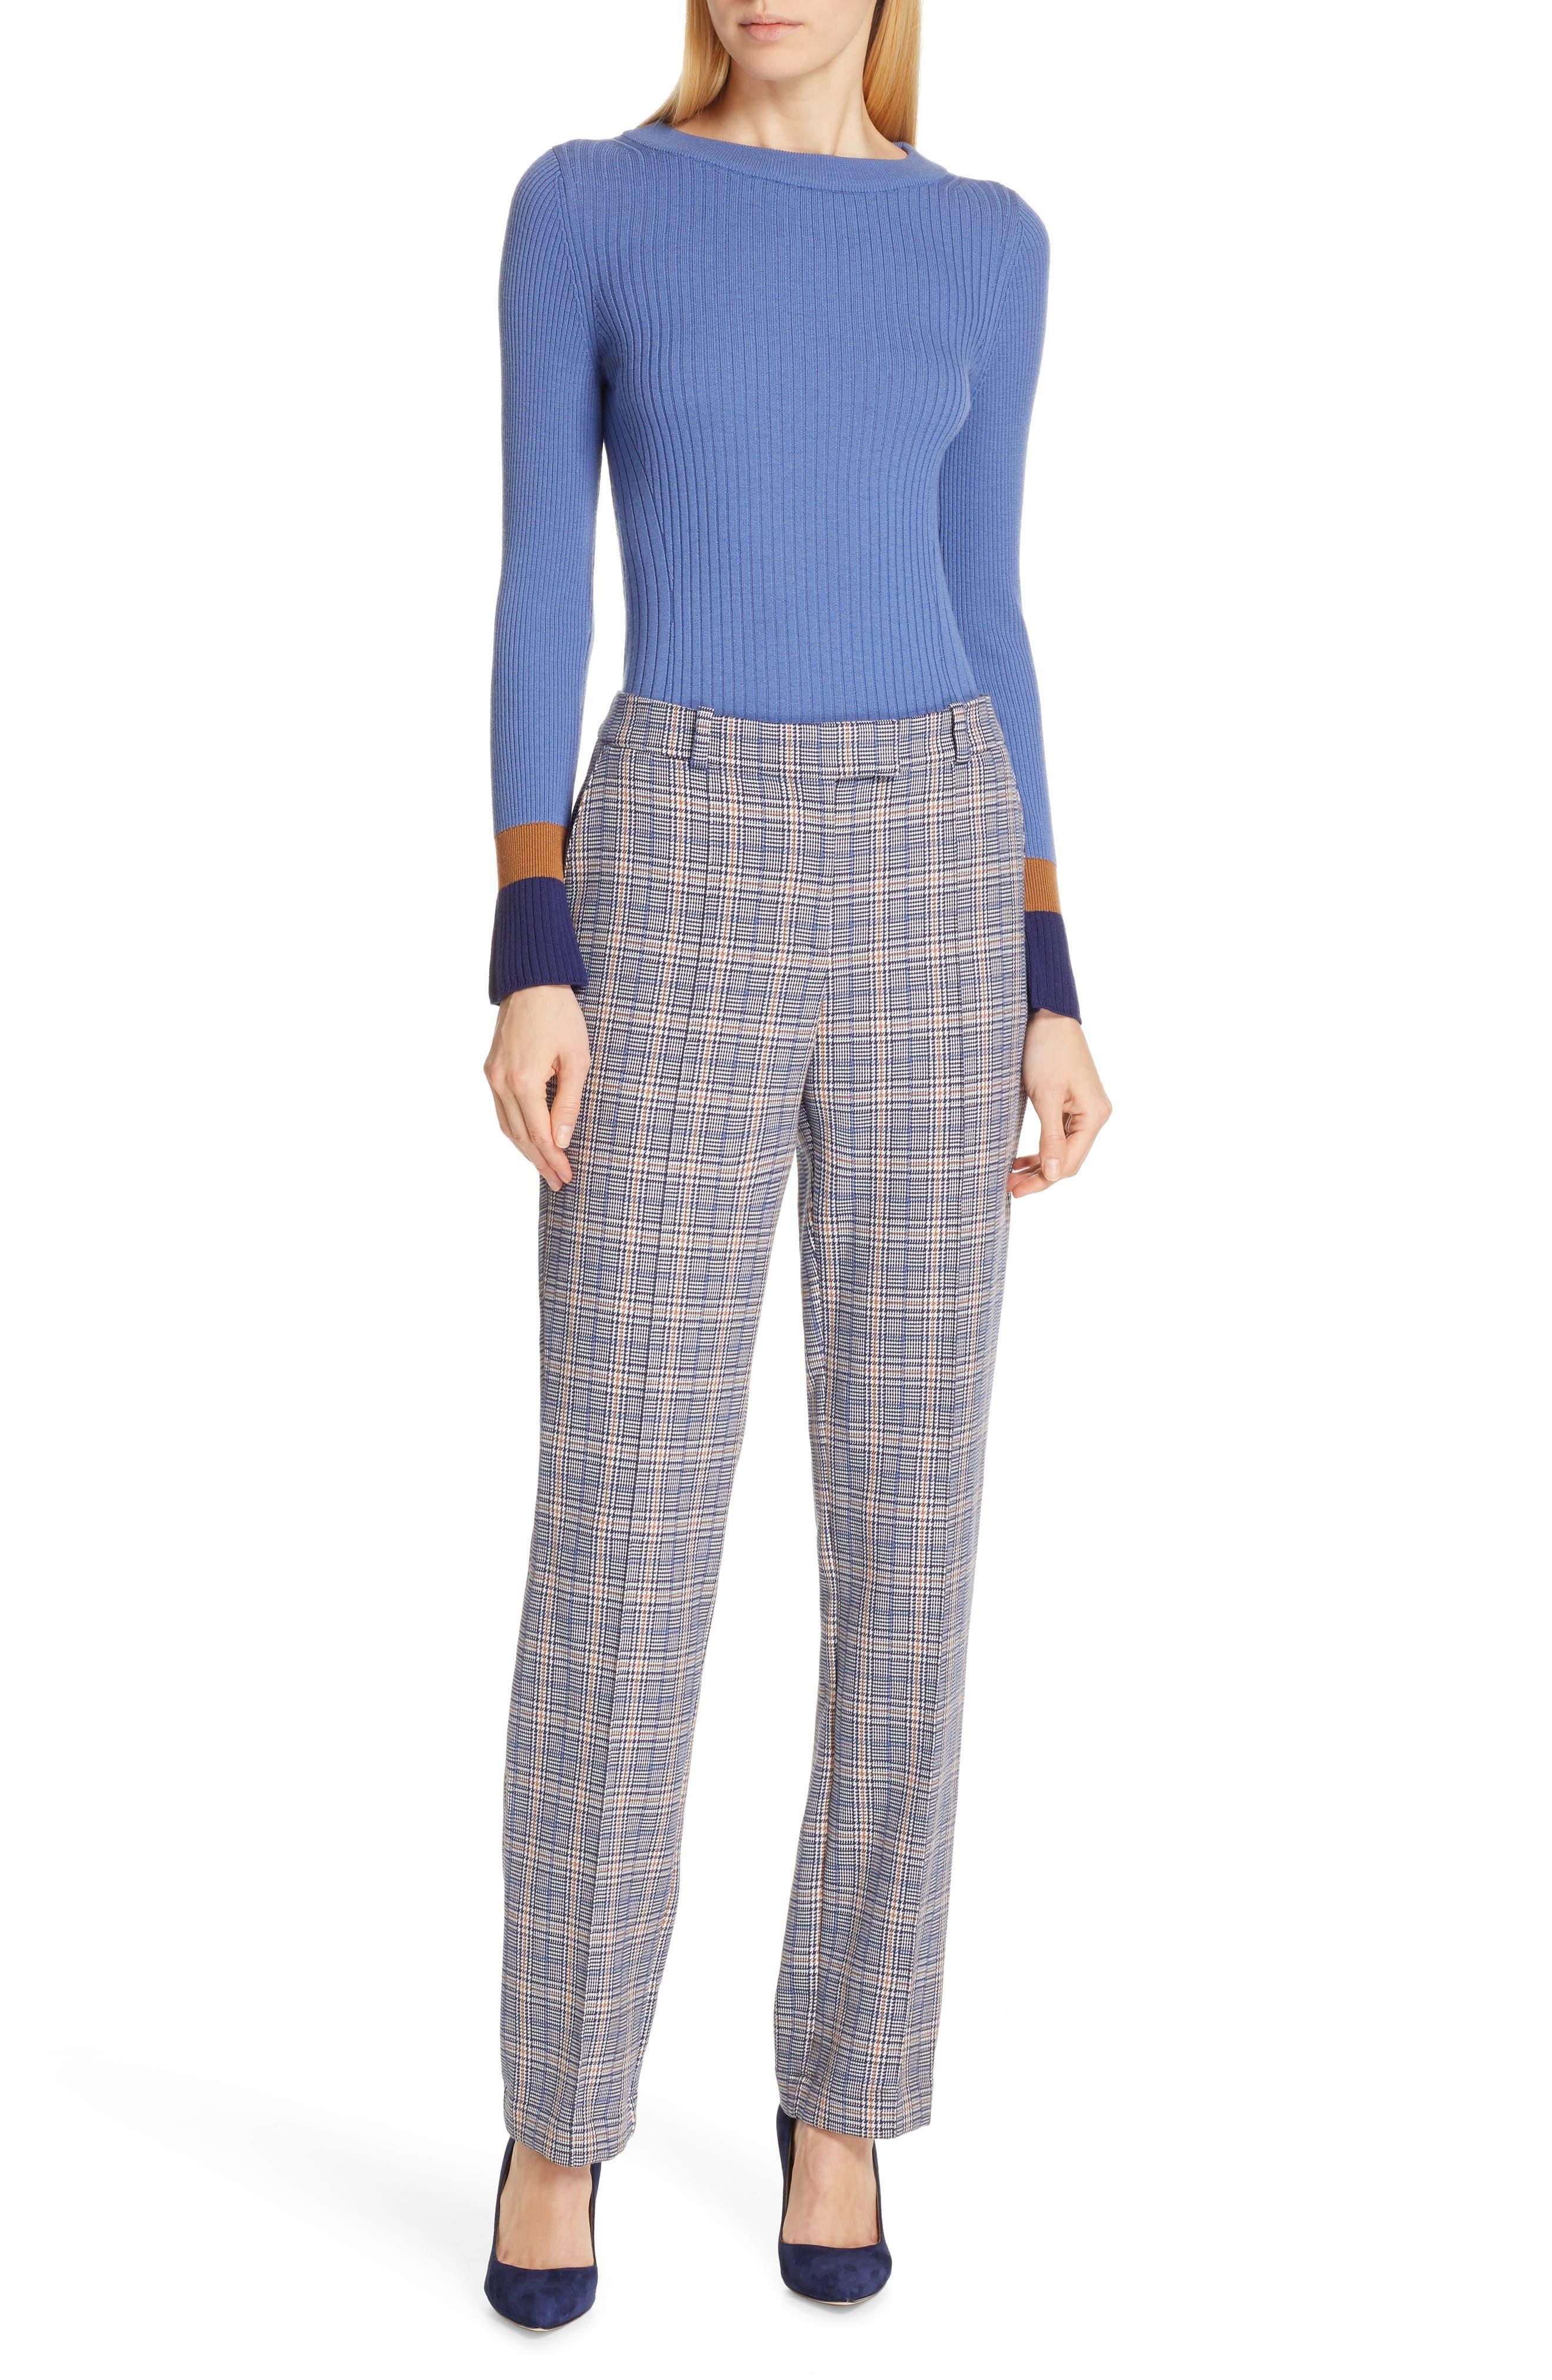 Fadeline Blue Fantasy Ribbed Wool Sweater,                             Alternate thumbnail 7, color,                             SOFT BLUE FANTASY